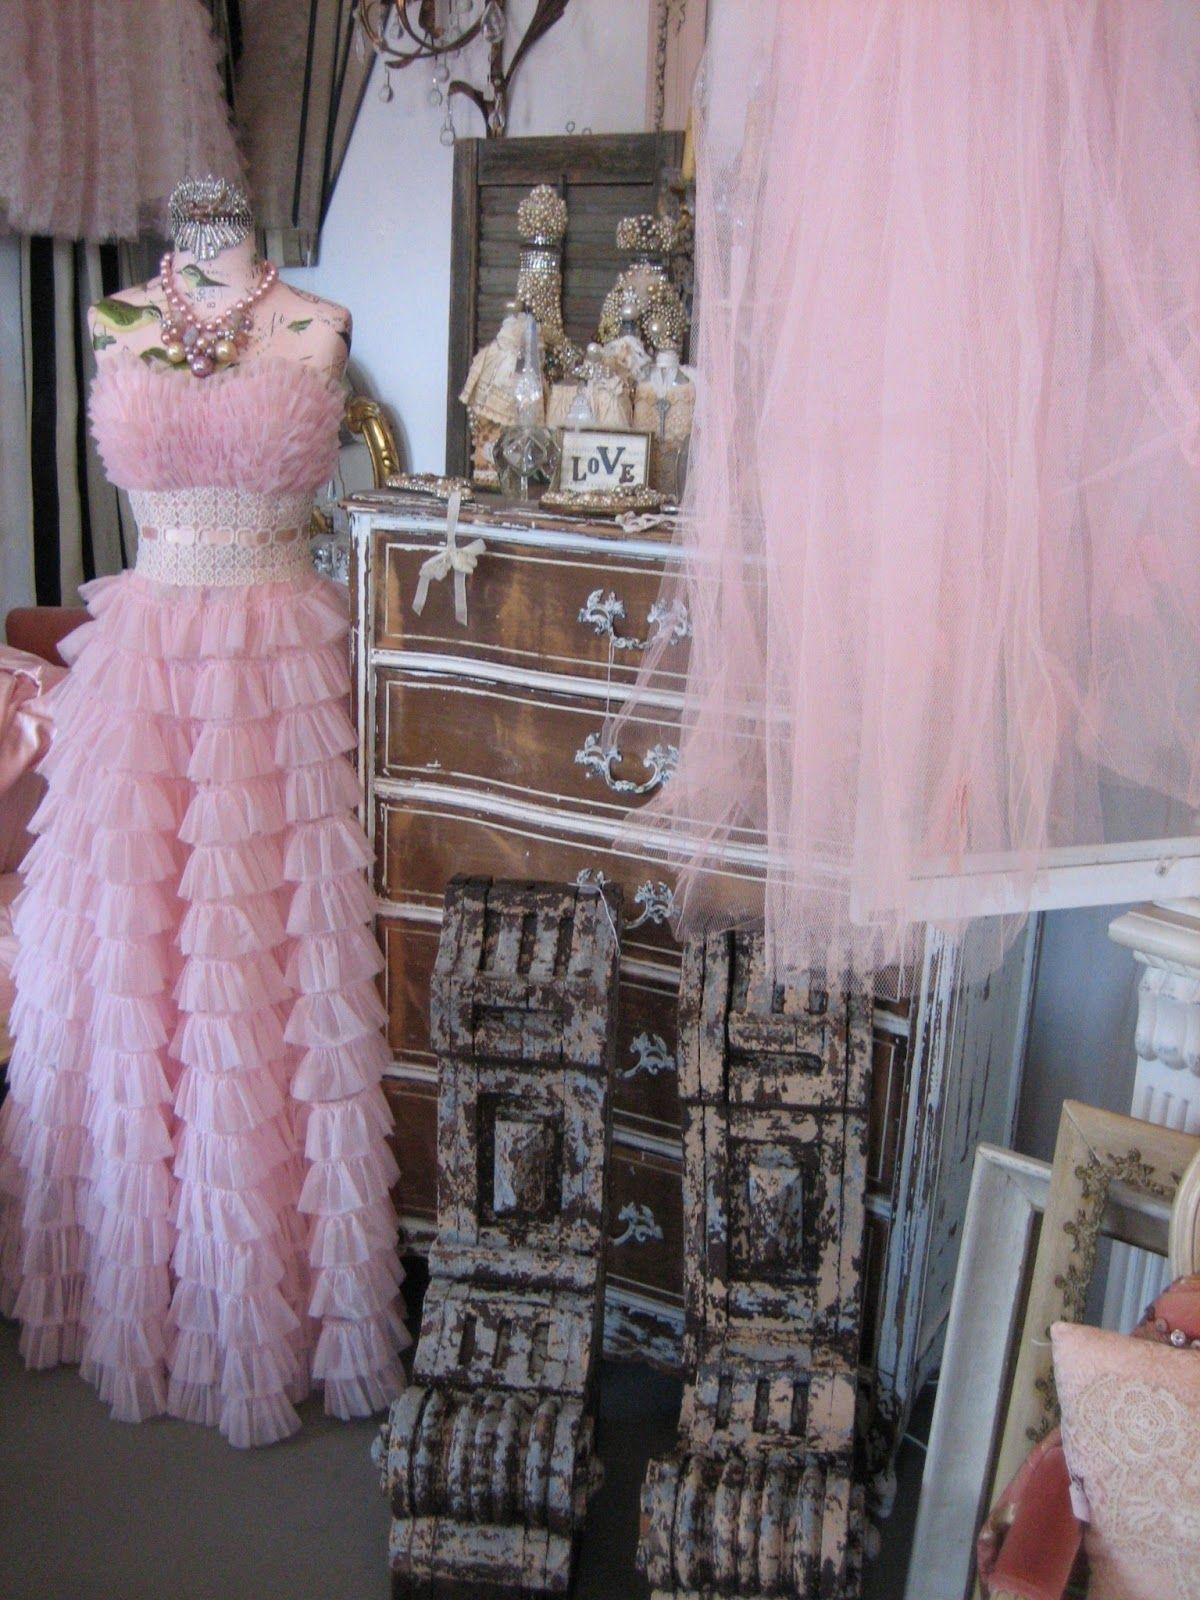 Vignettes antiques vintage us prom dresses u tulle pinterest